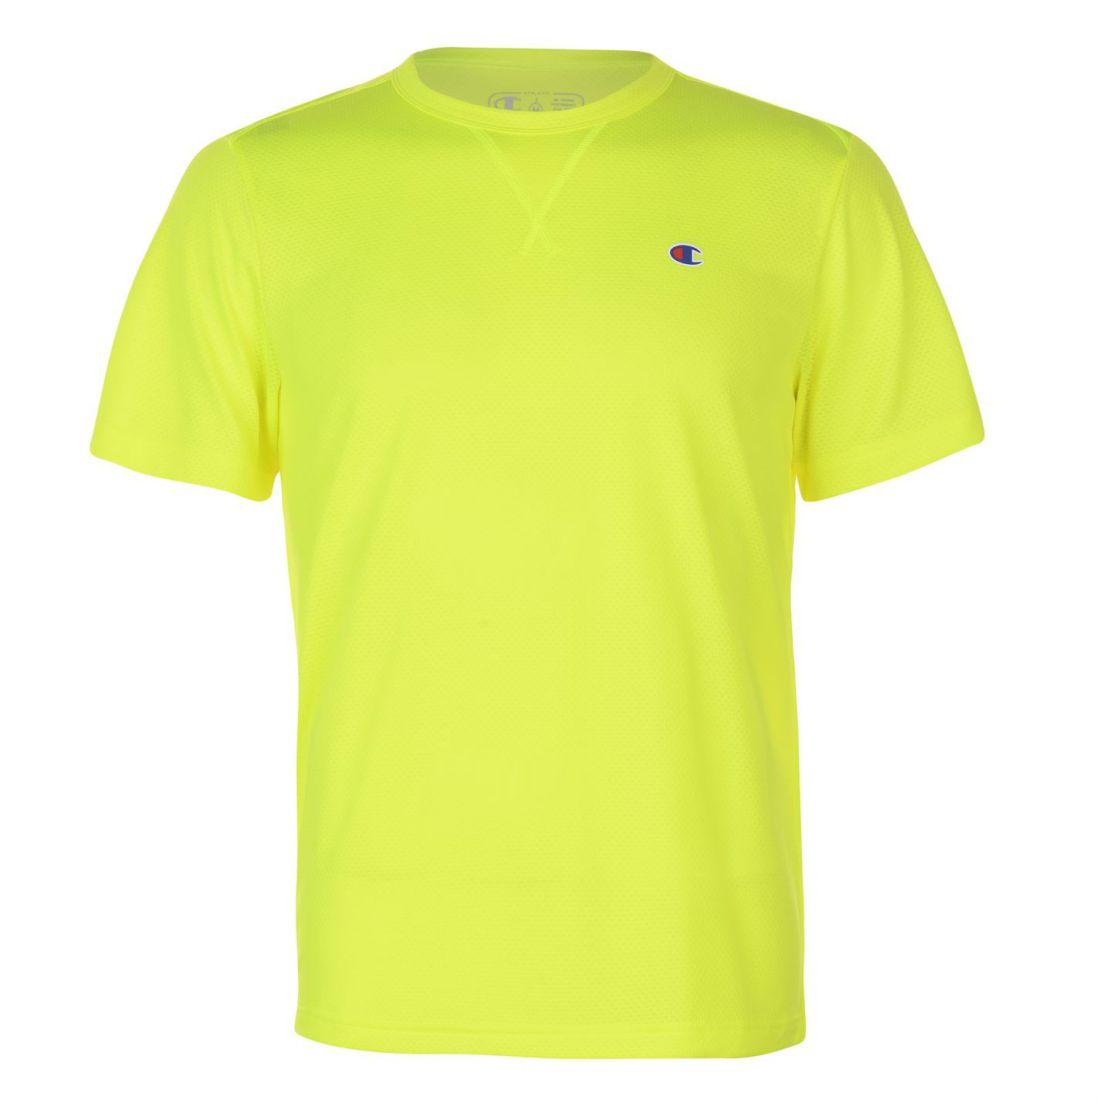 4c2ad4129602 Champion Mens Mesh T Shirt Short Sleeve Performance Tee Top Round ...